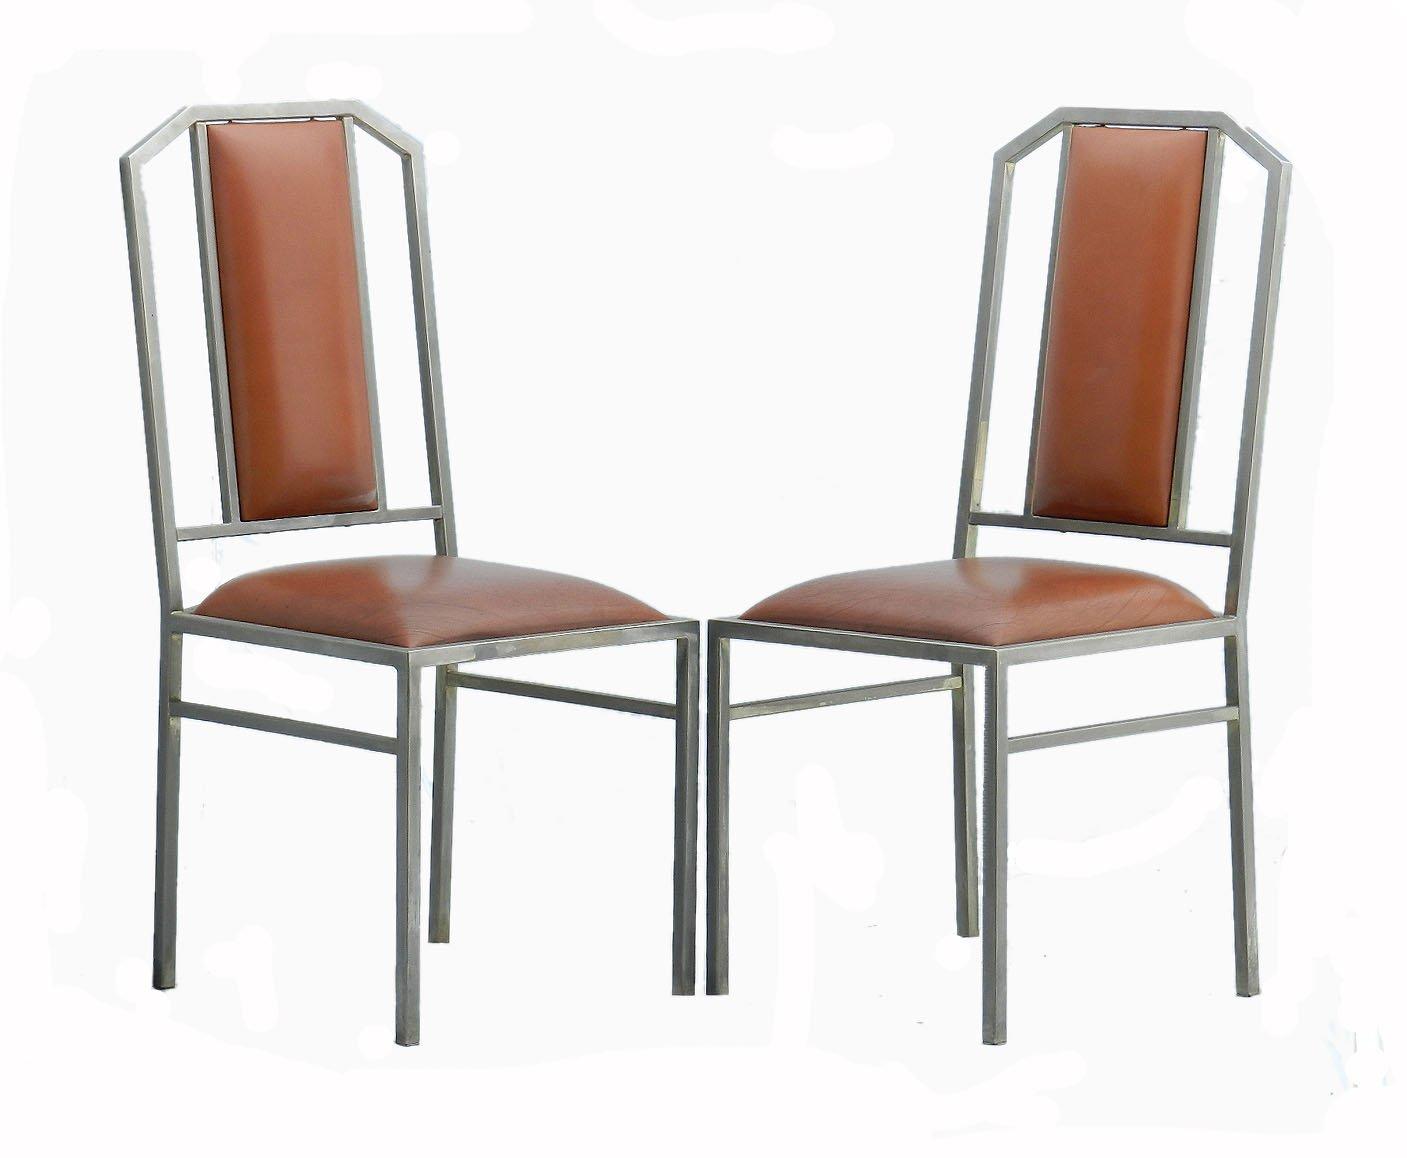 Sedie Di Metallo Vintage : Sedie da pranzo vintage in metallo e pelle di maison jansen set